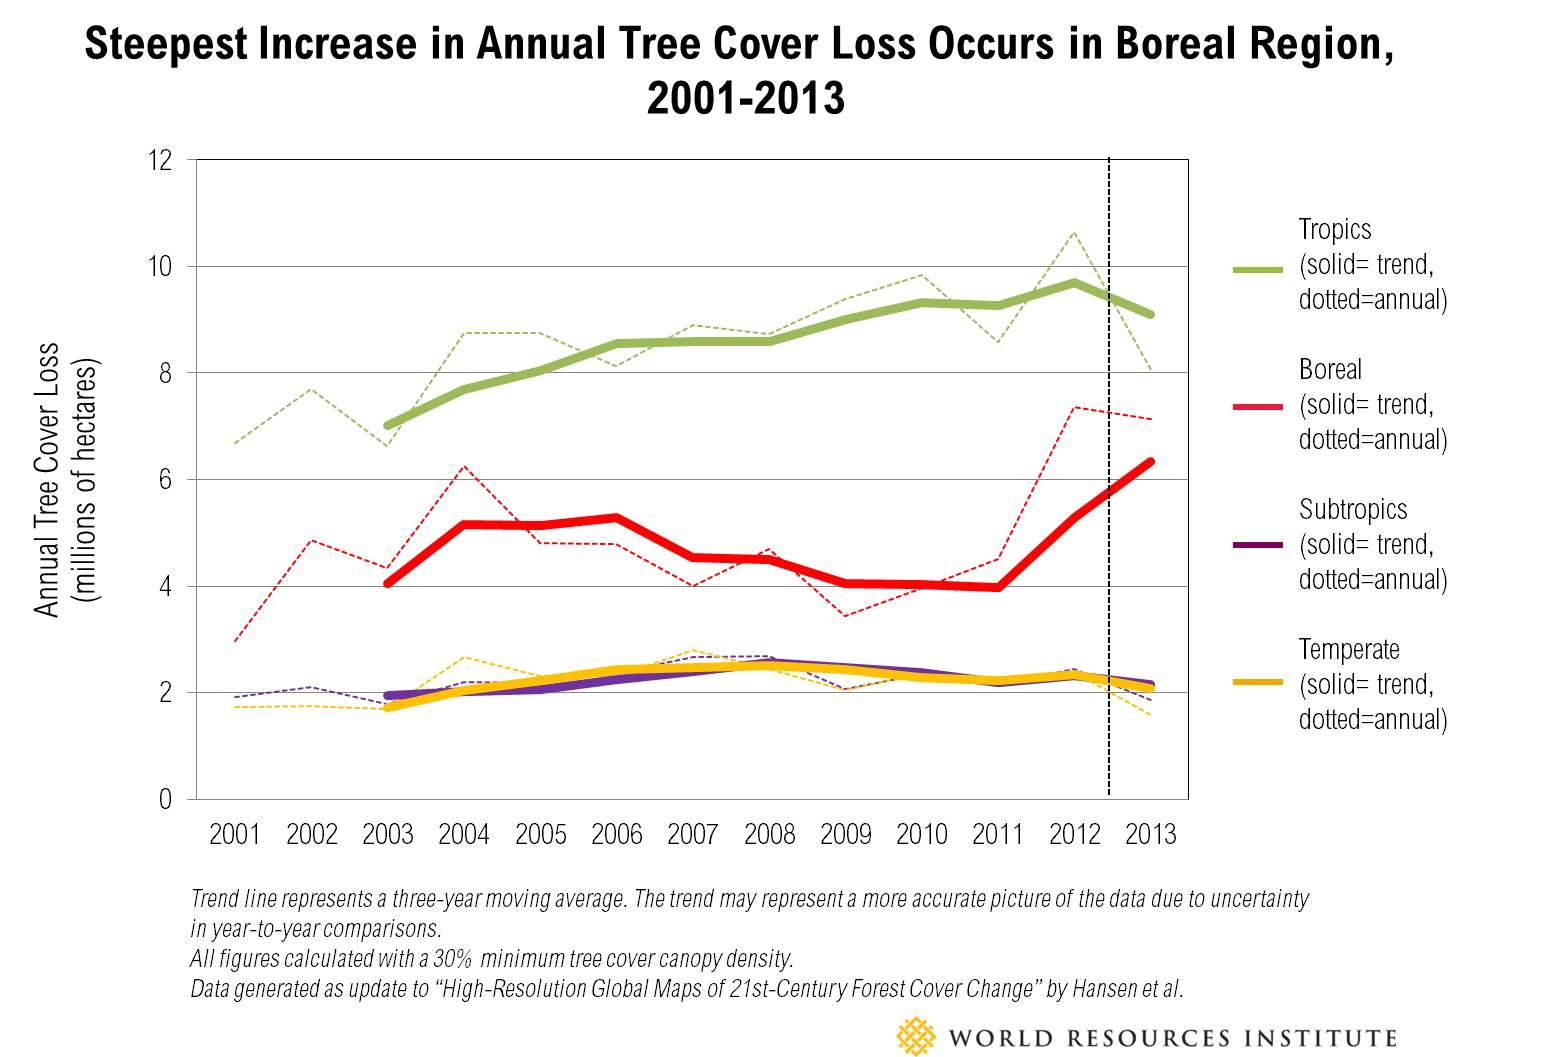 Boreal increase line graph